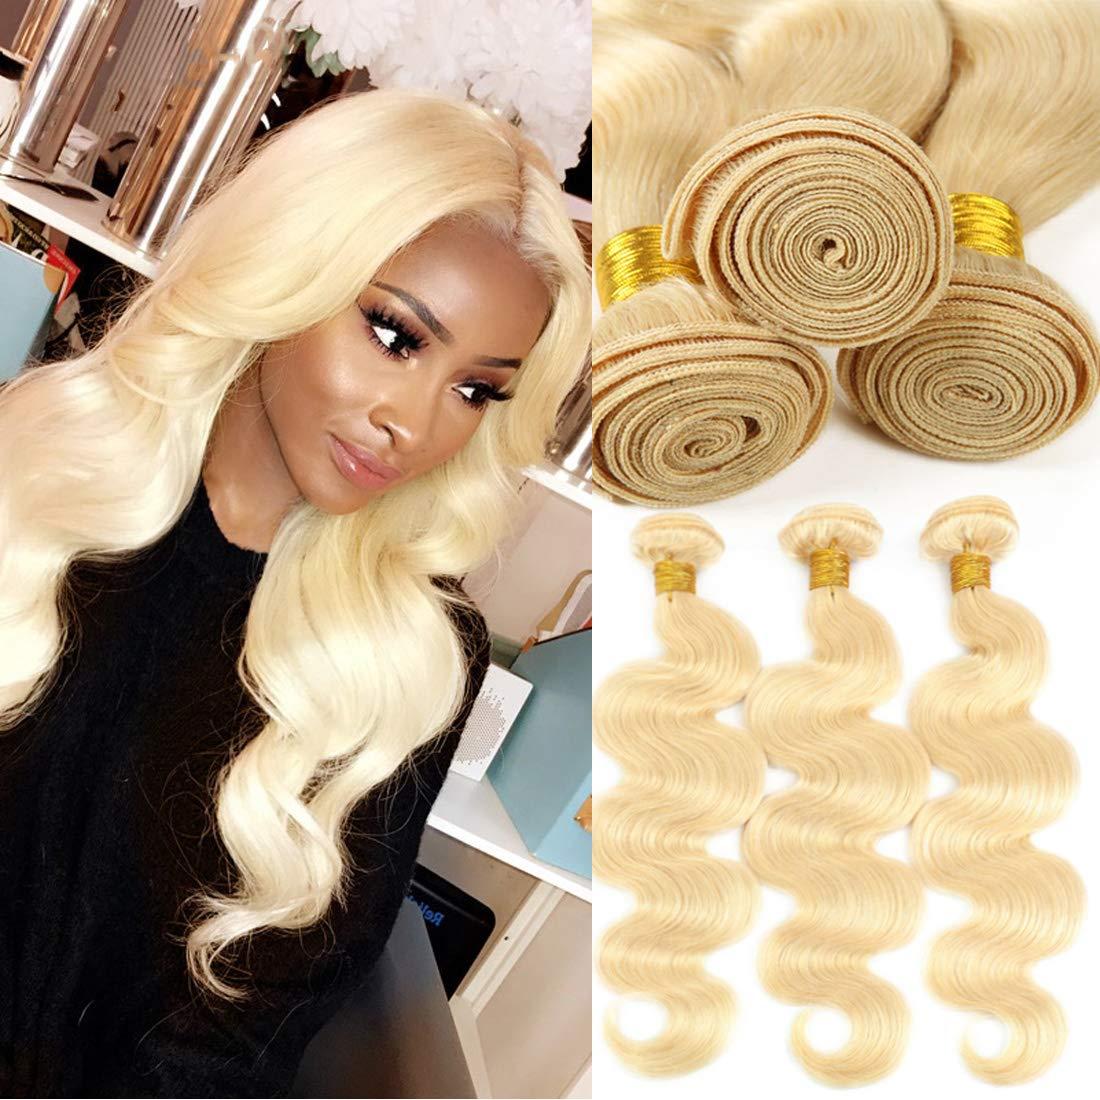 Jolibabe 613 Blonde Virgin Hair 3 Wave Body Bundles Fixed price for sale Brazilian List price Vi